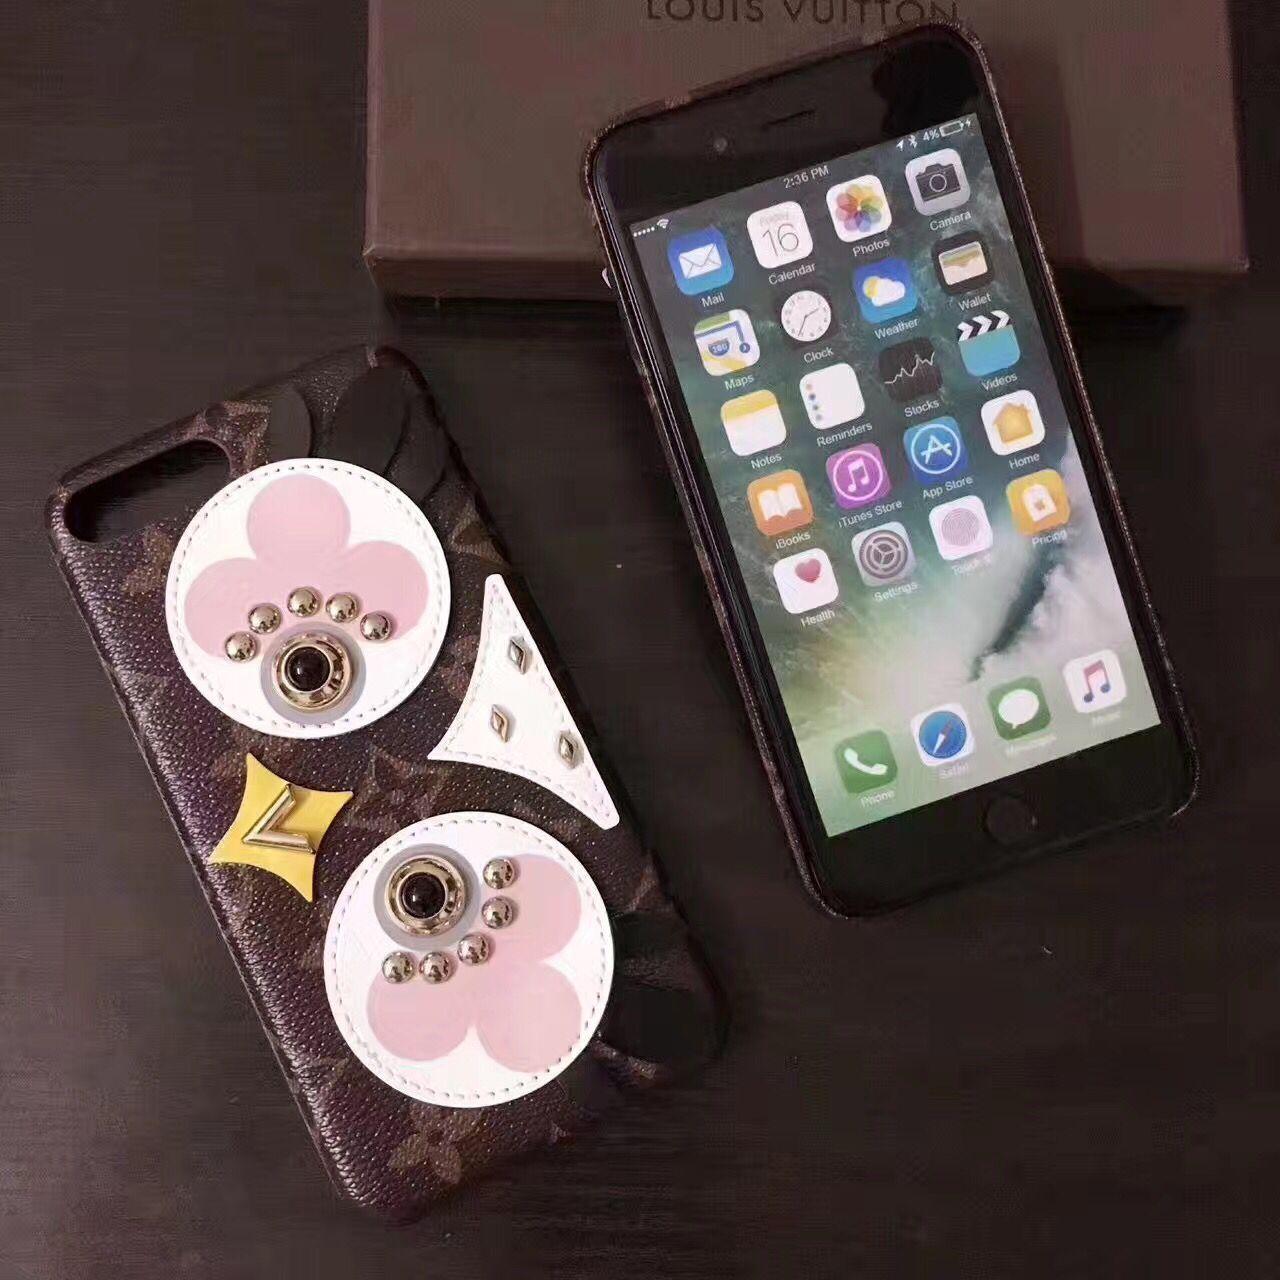 lederhülle iphone iphone hüllen günstig Louis Vuitton iphone7 hülle eigene hülle gestalten handy cover eigenes foto silikon schutzhülle veröffentlichung iphone 6 smartphone 7lbst gestalten iphone etuis